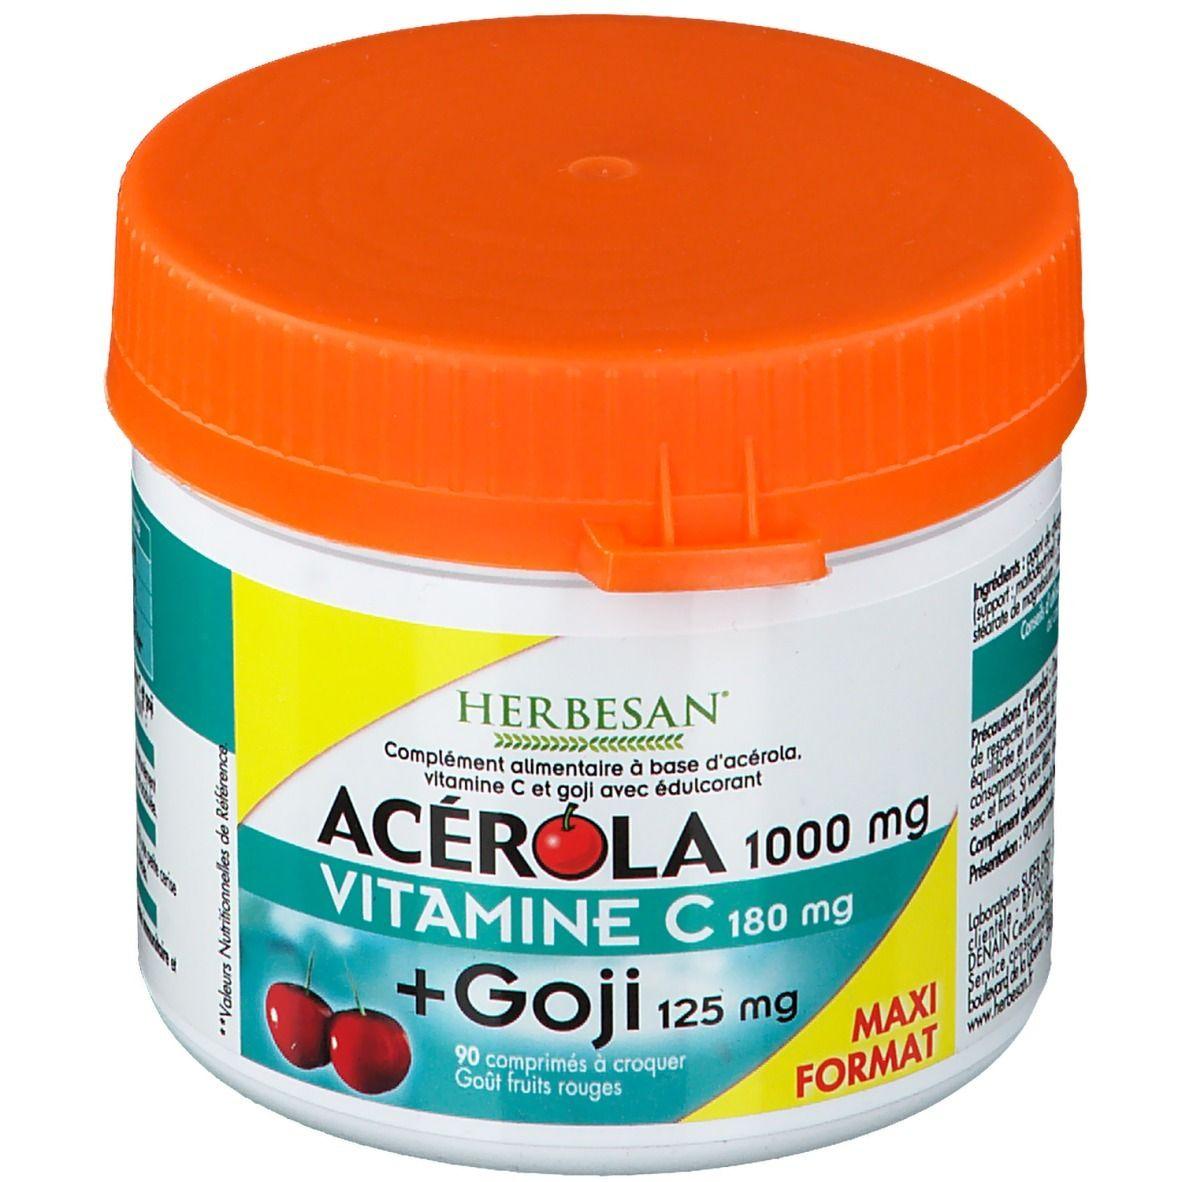 Herbesan® Acérola 1000 Goji pc(s) comprimé(s)